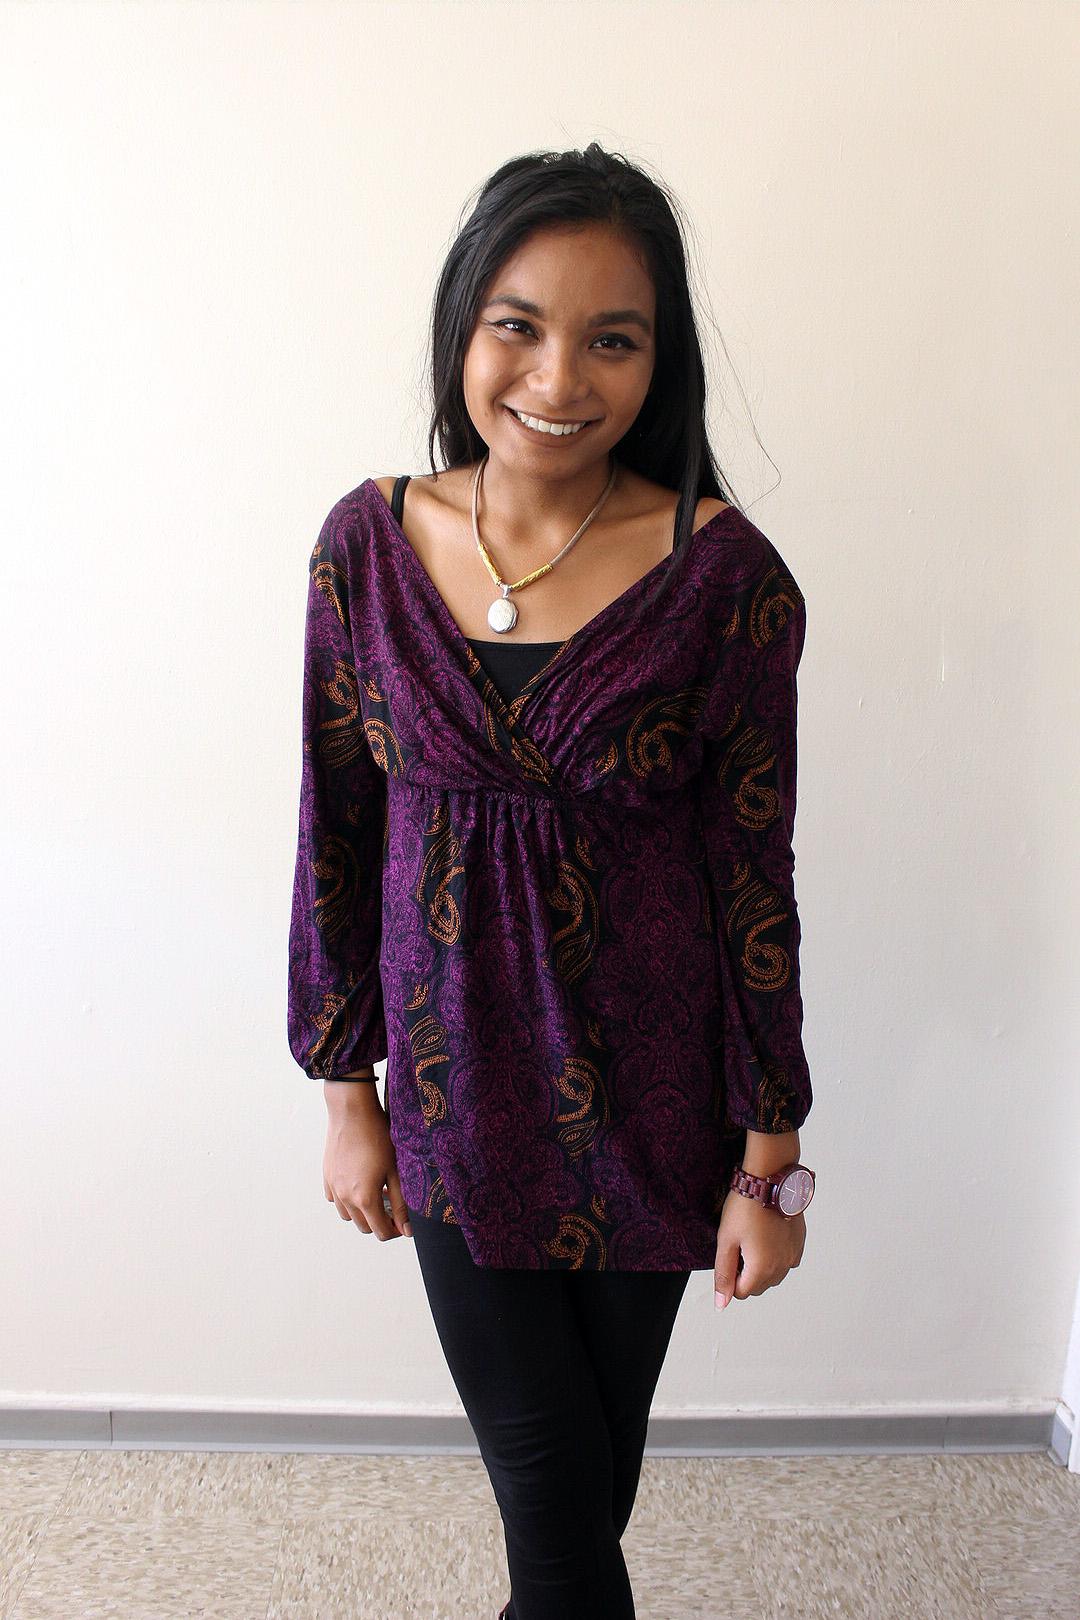 Purple-Top-For-Fall-Style-Blogger-Fashionista-LINDATENCHITRAN-1-1616x1080